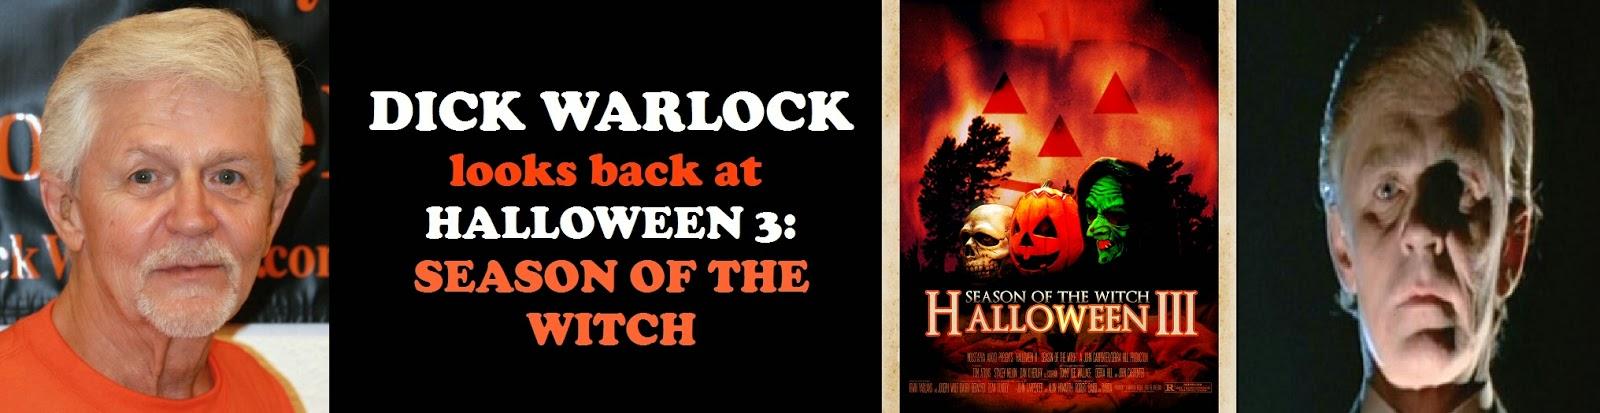 Dick Warlock talks about Halloween 3: Season Of The Witch ...